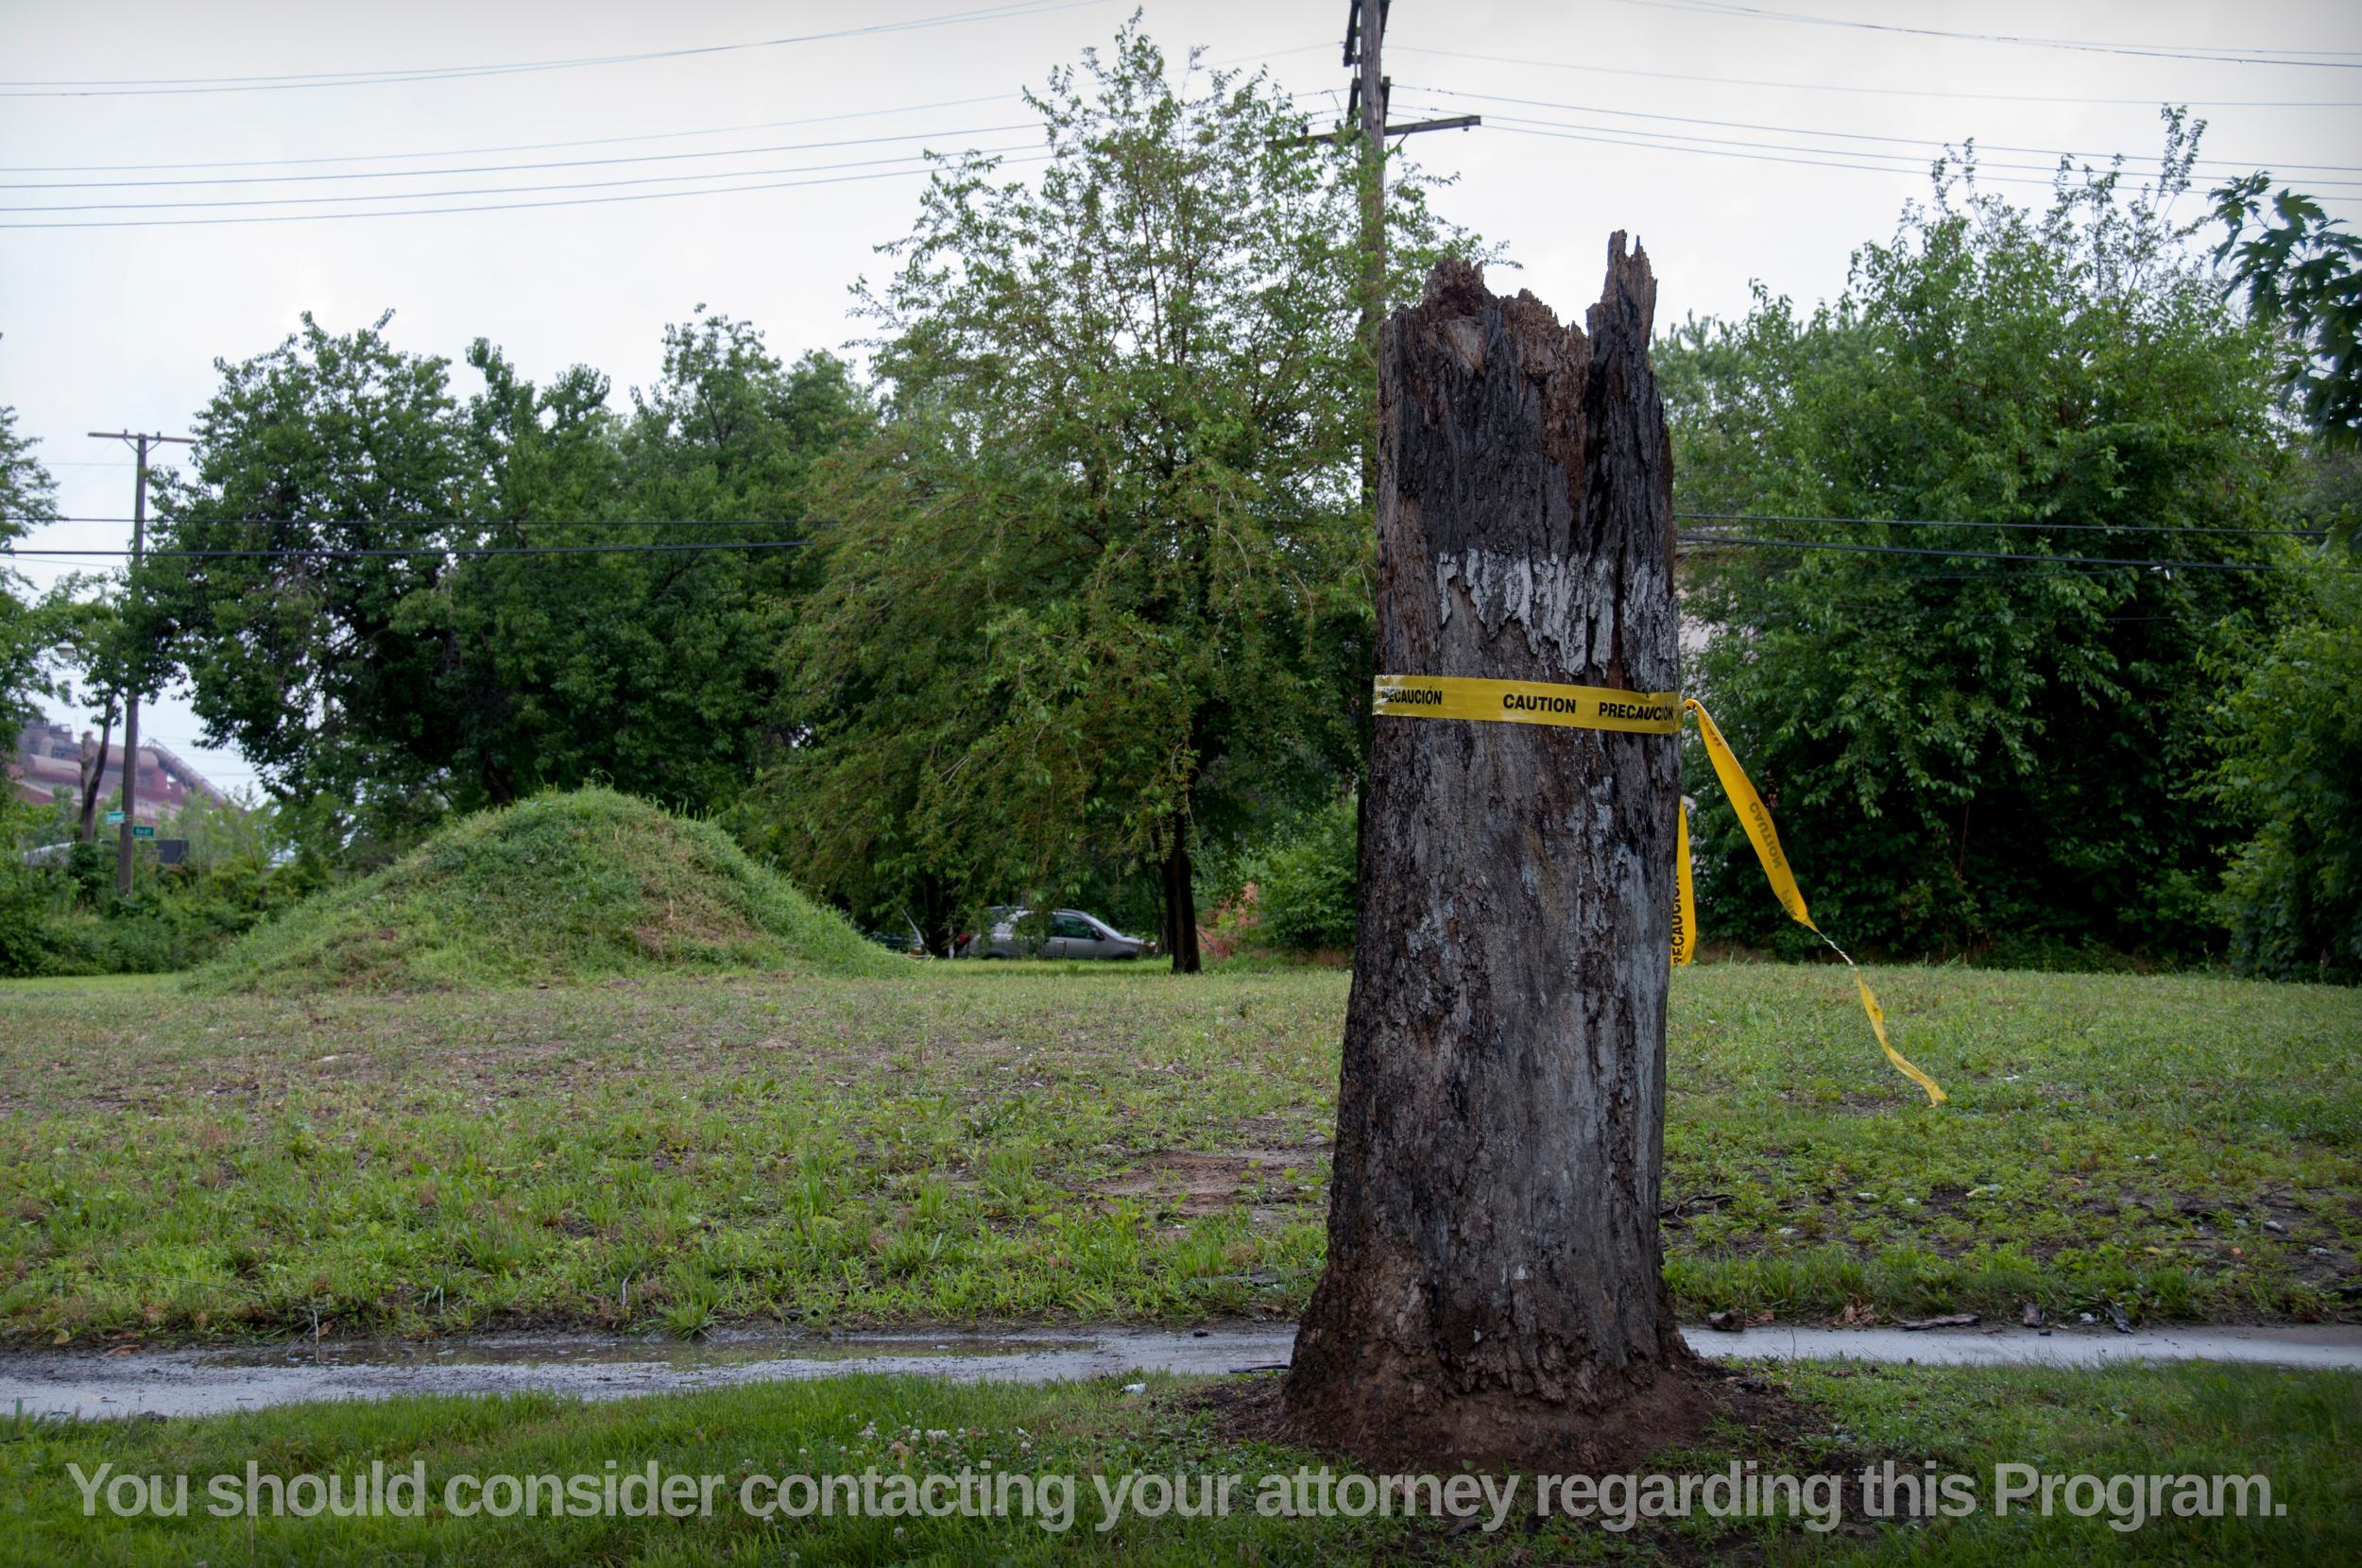 45-Tree-Caution+Tape-Contact+A-3578947084-O.jpg